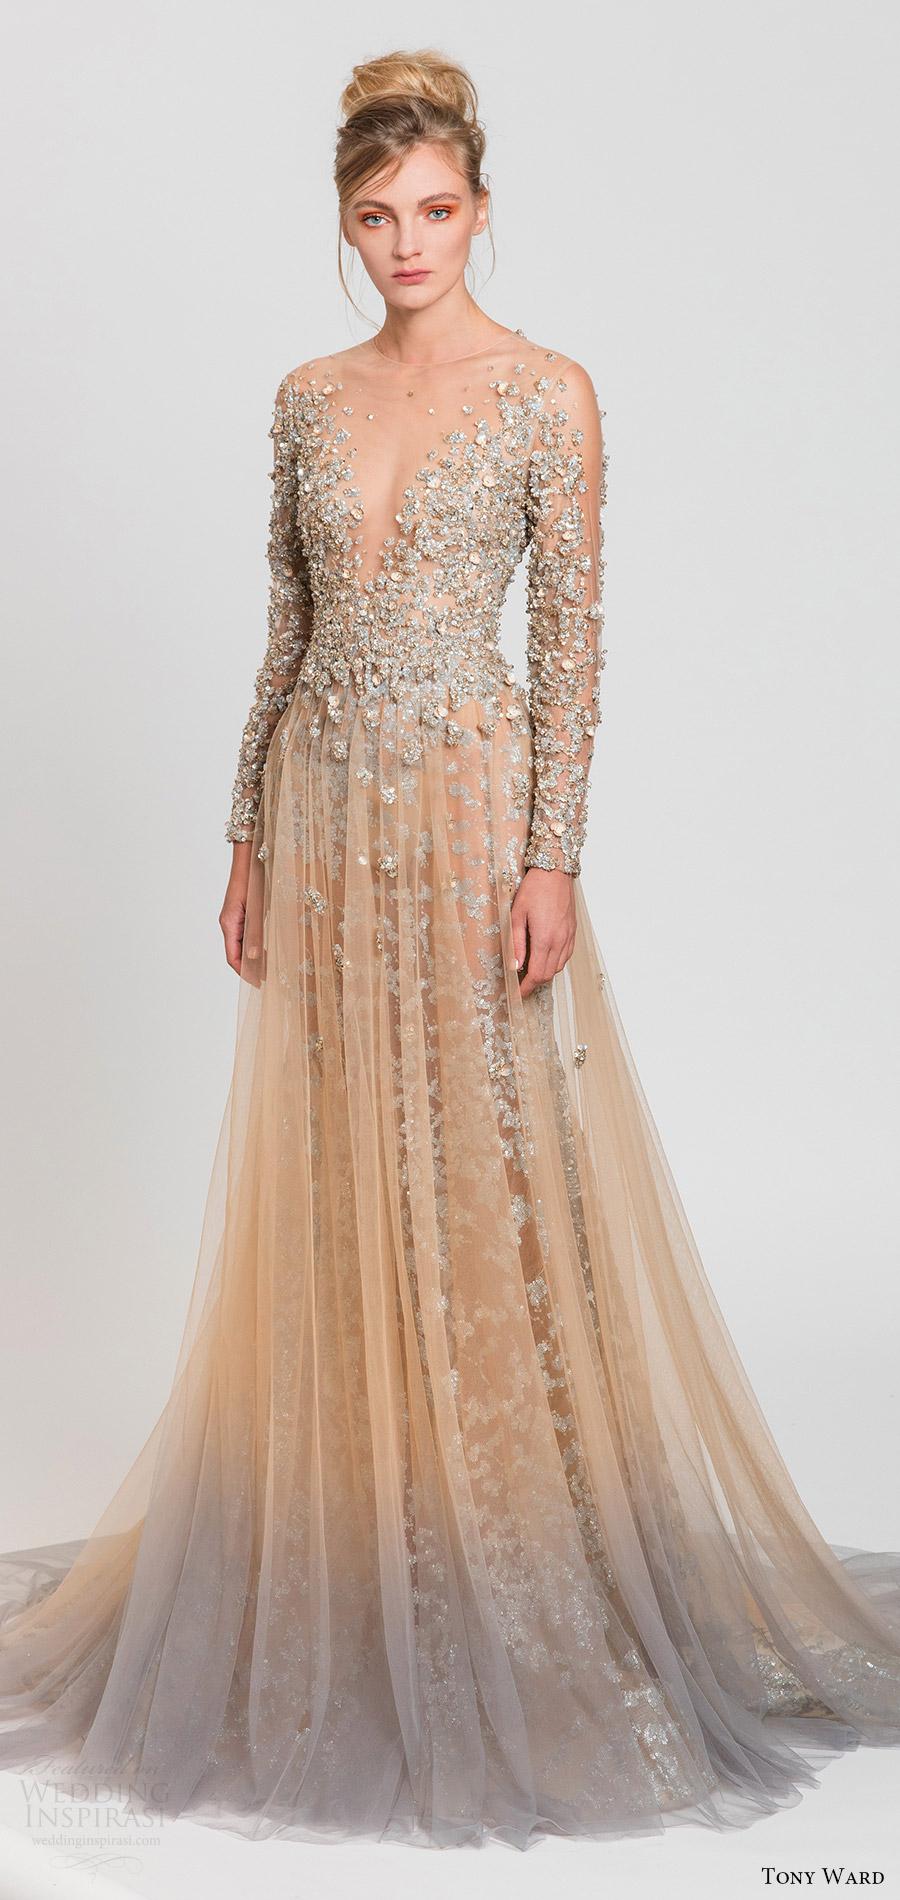 a20bdea7c8 tony ward spring 2017 rtw illusion long sleeves deep v neck blush fully  embellished aline dress